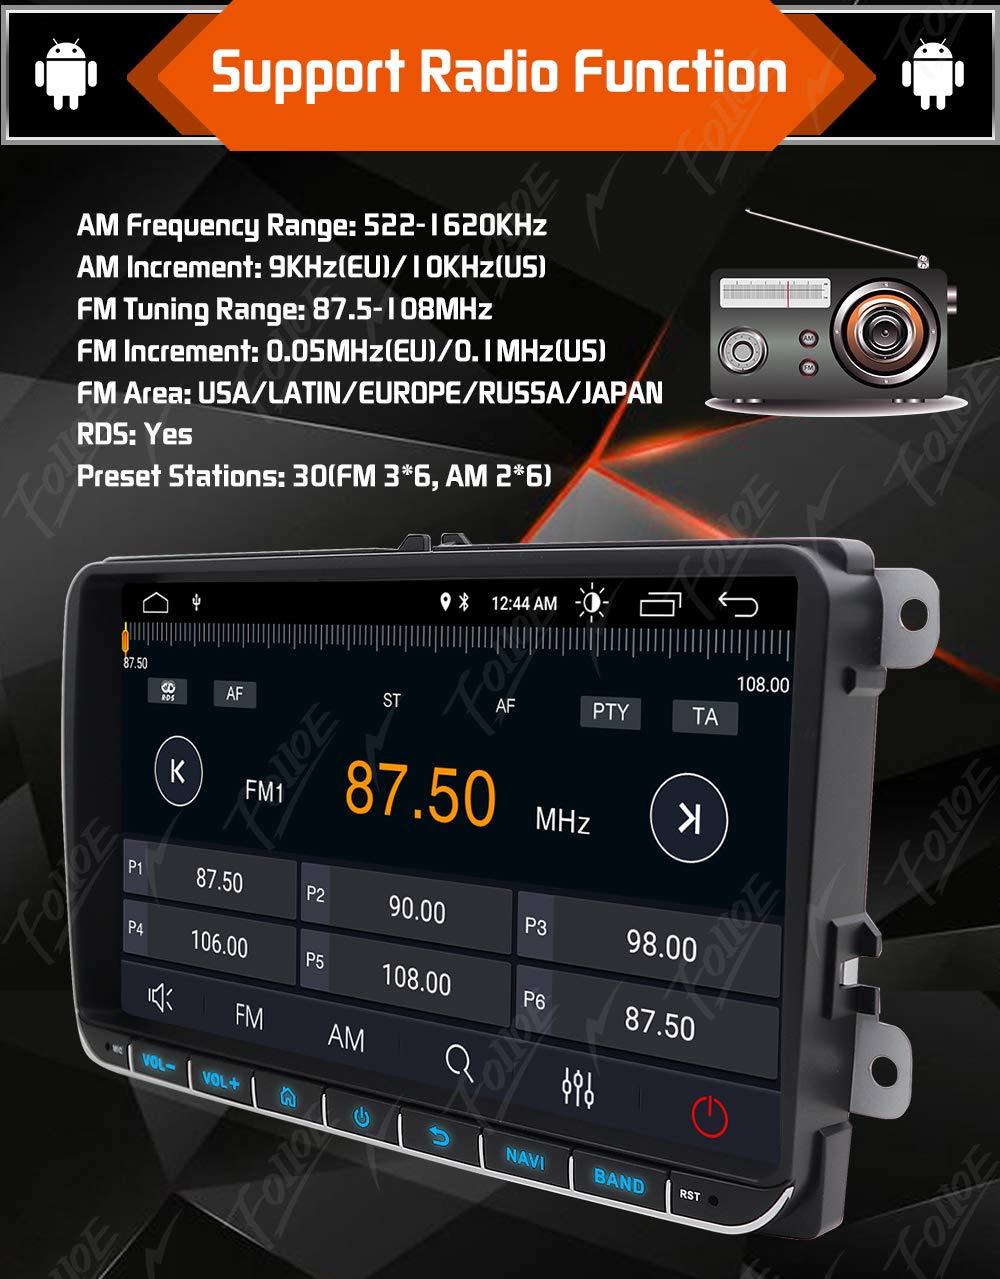 Navegador GPS est/éreo para coche para VW doble DIN unidad de 9 pulgadas 2 DIN est/éreo de 32 GB ROM compatible con GPS Navi USB FM AM RDS Bluetooth SWC sistema Android 9.0 + c/ámara de visi/ón trasera